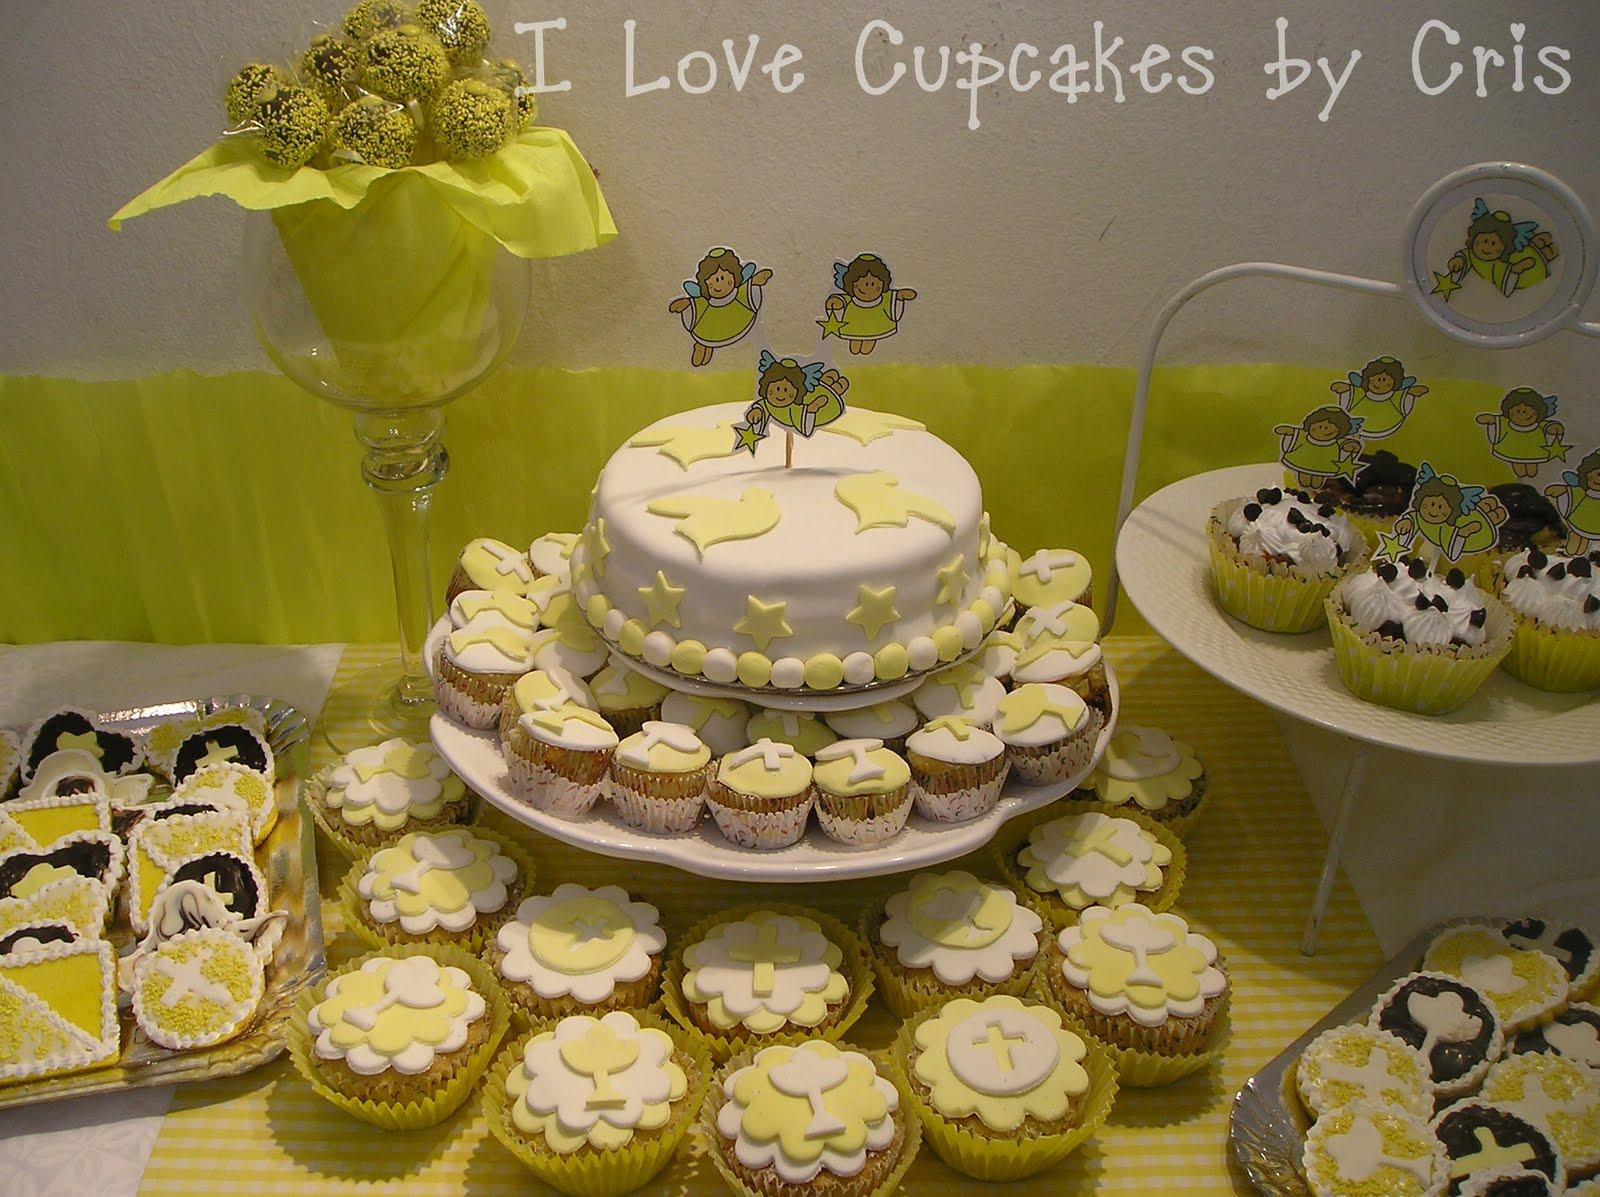 I love cupcakes mesa dulce para comunion - Preparar mesa dulce para comunion ...